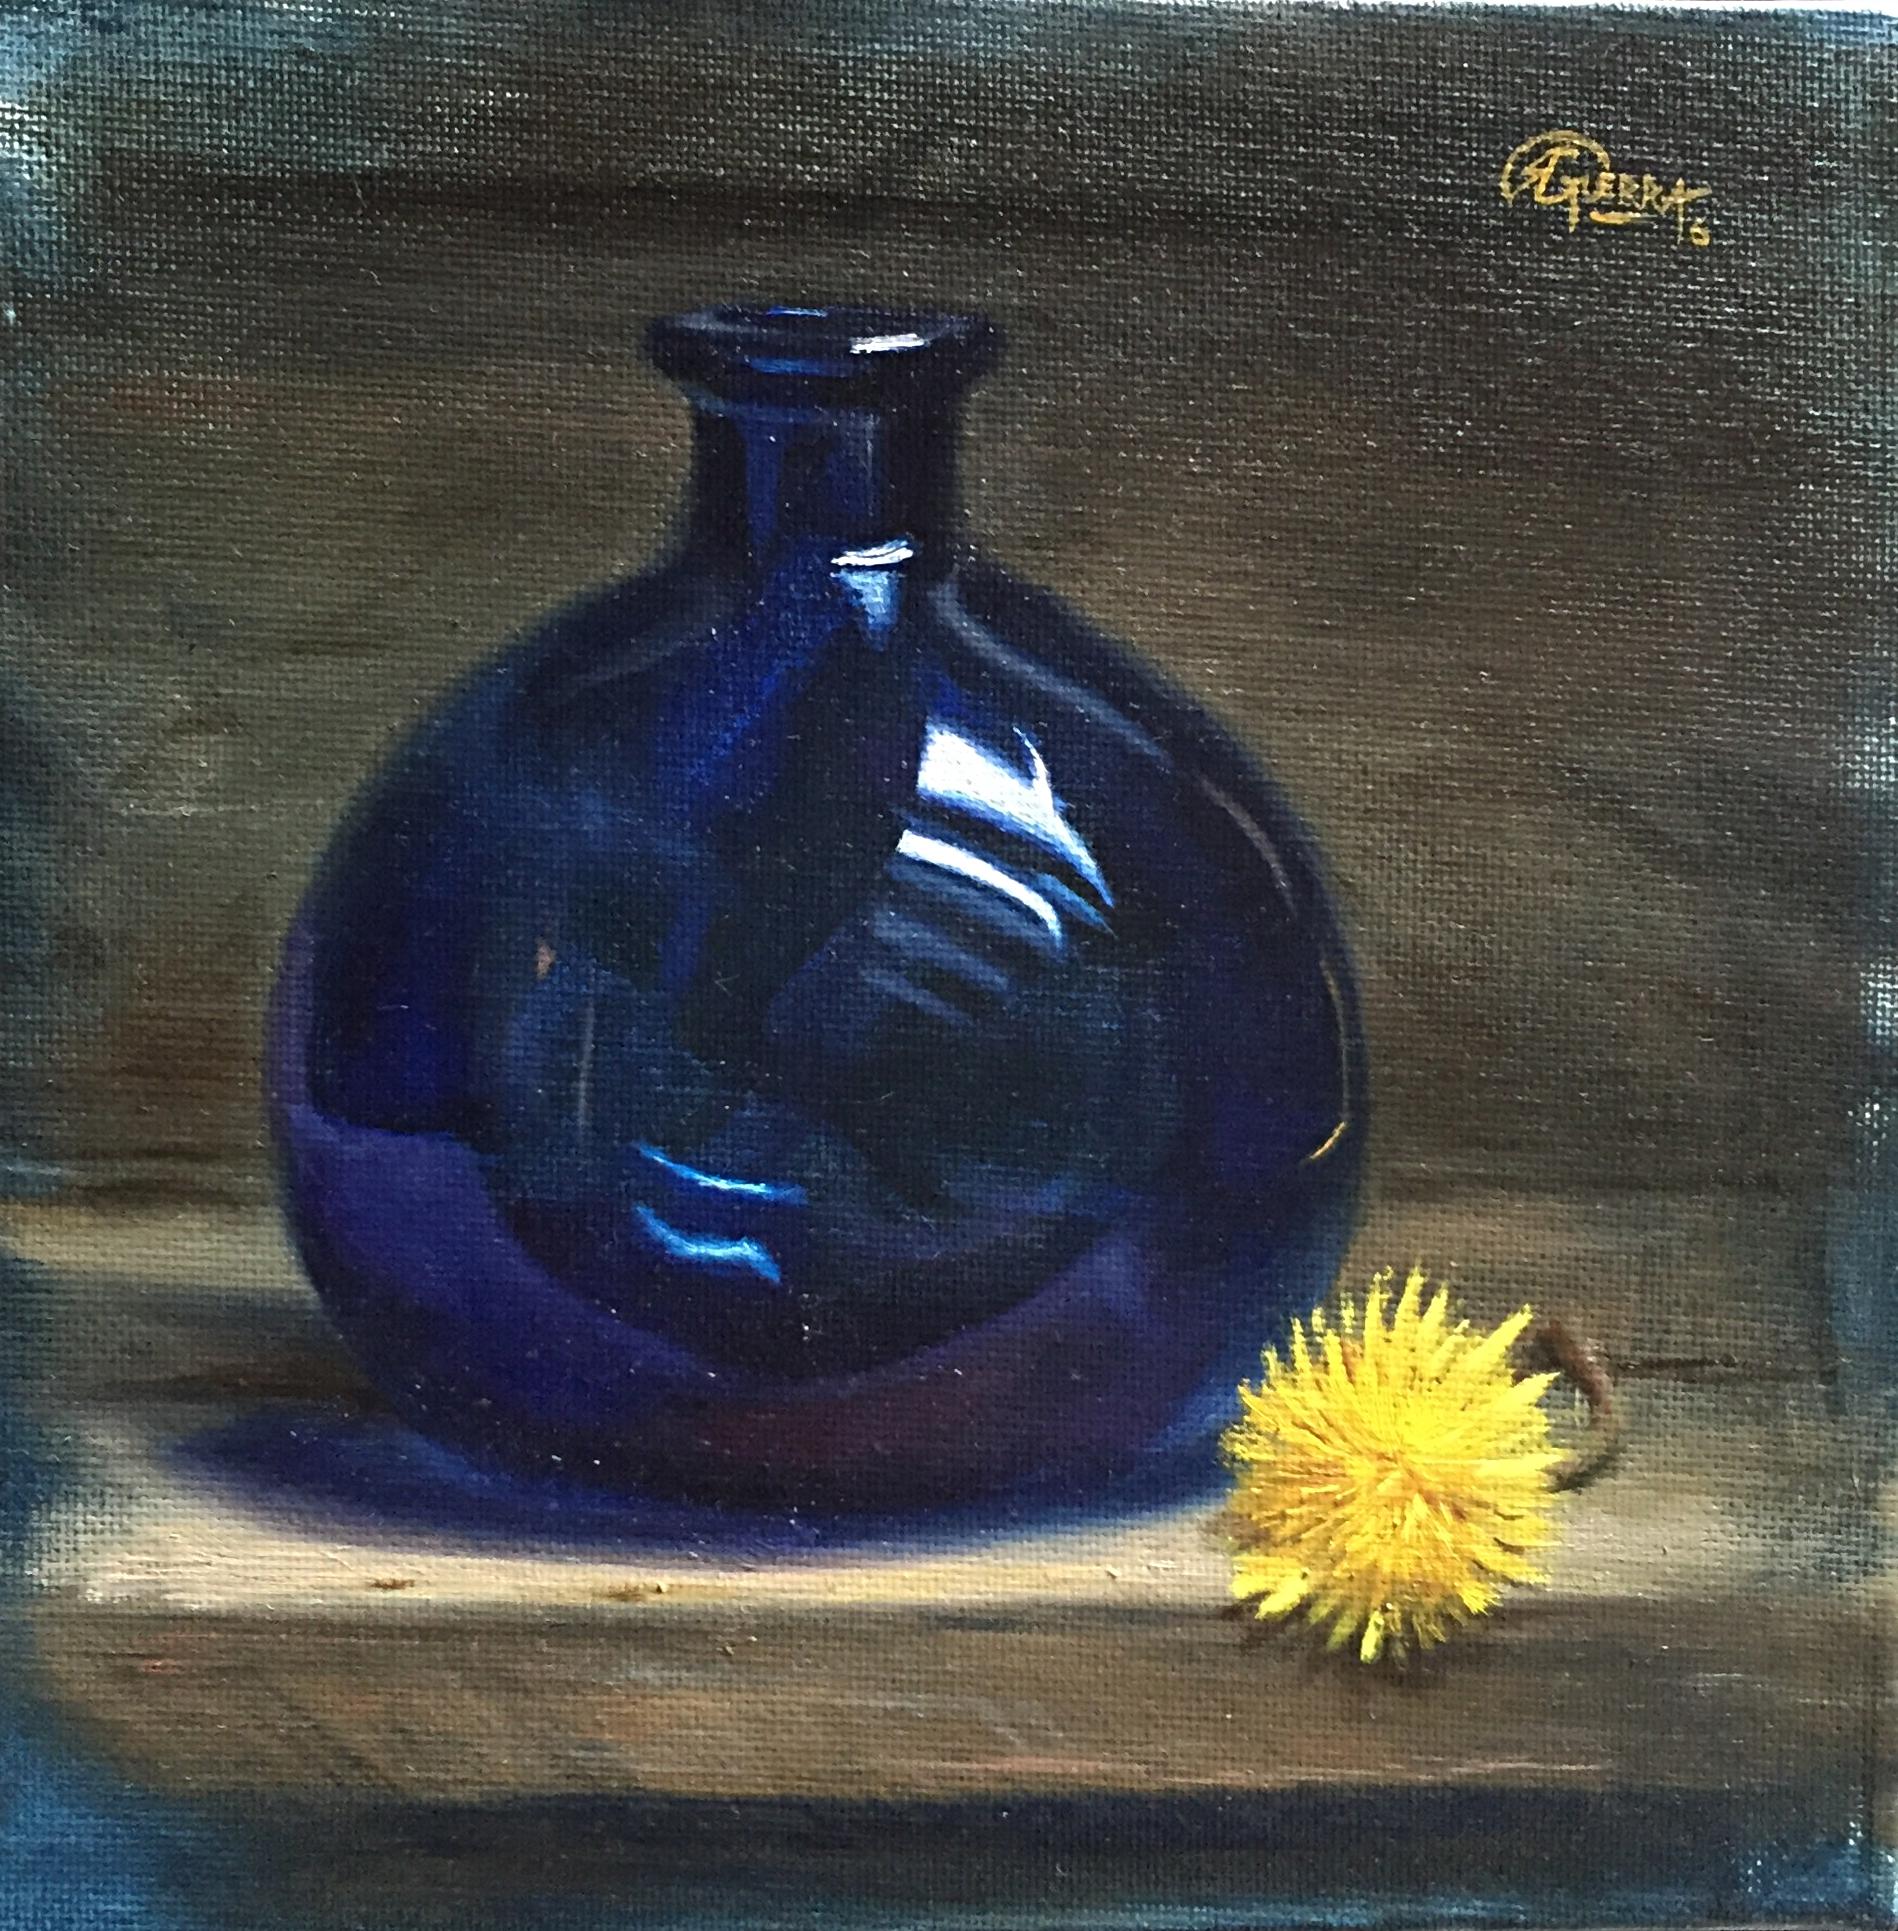 Blue Glass Vase and Dandelion Flower